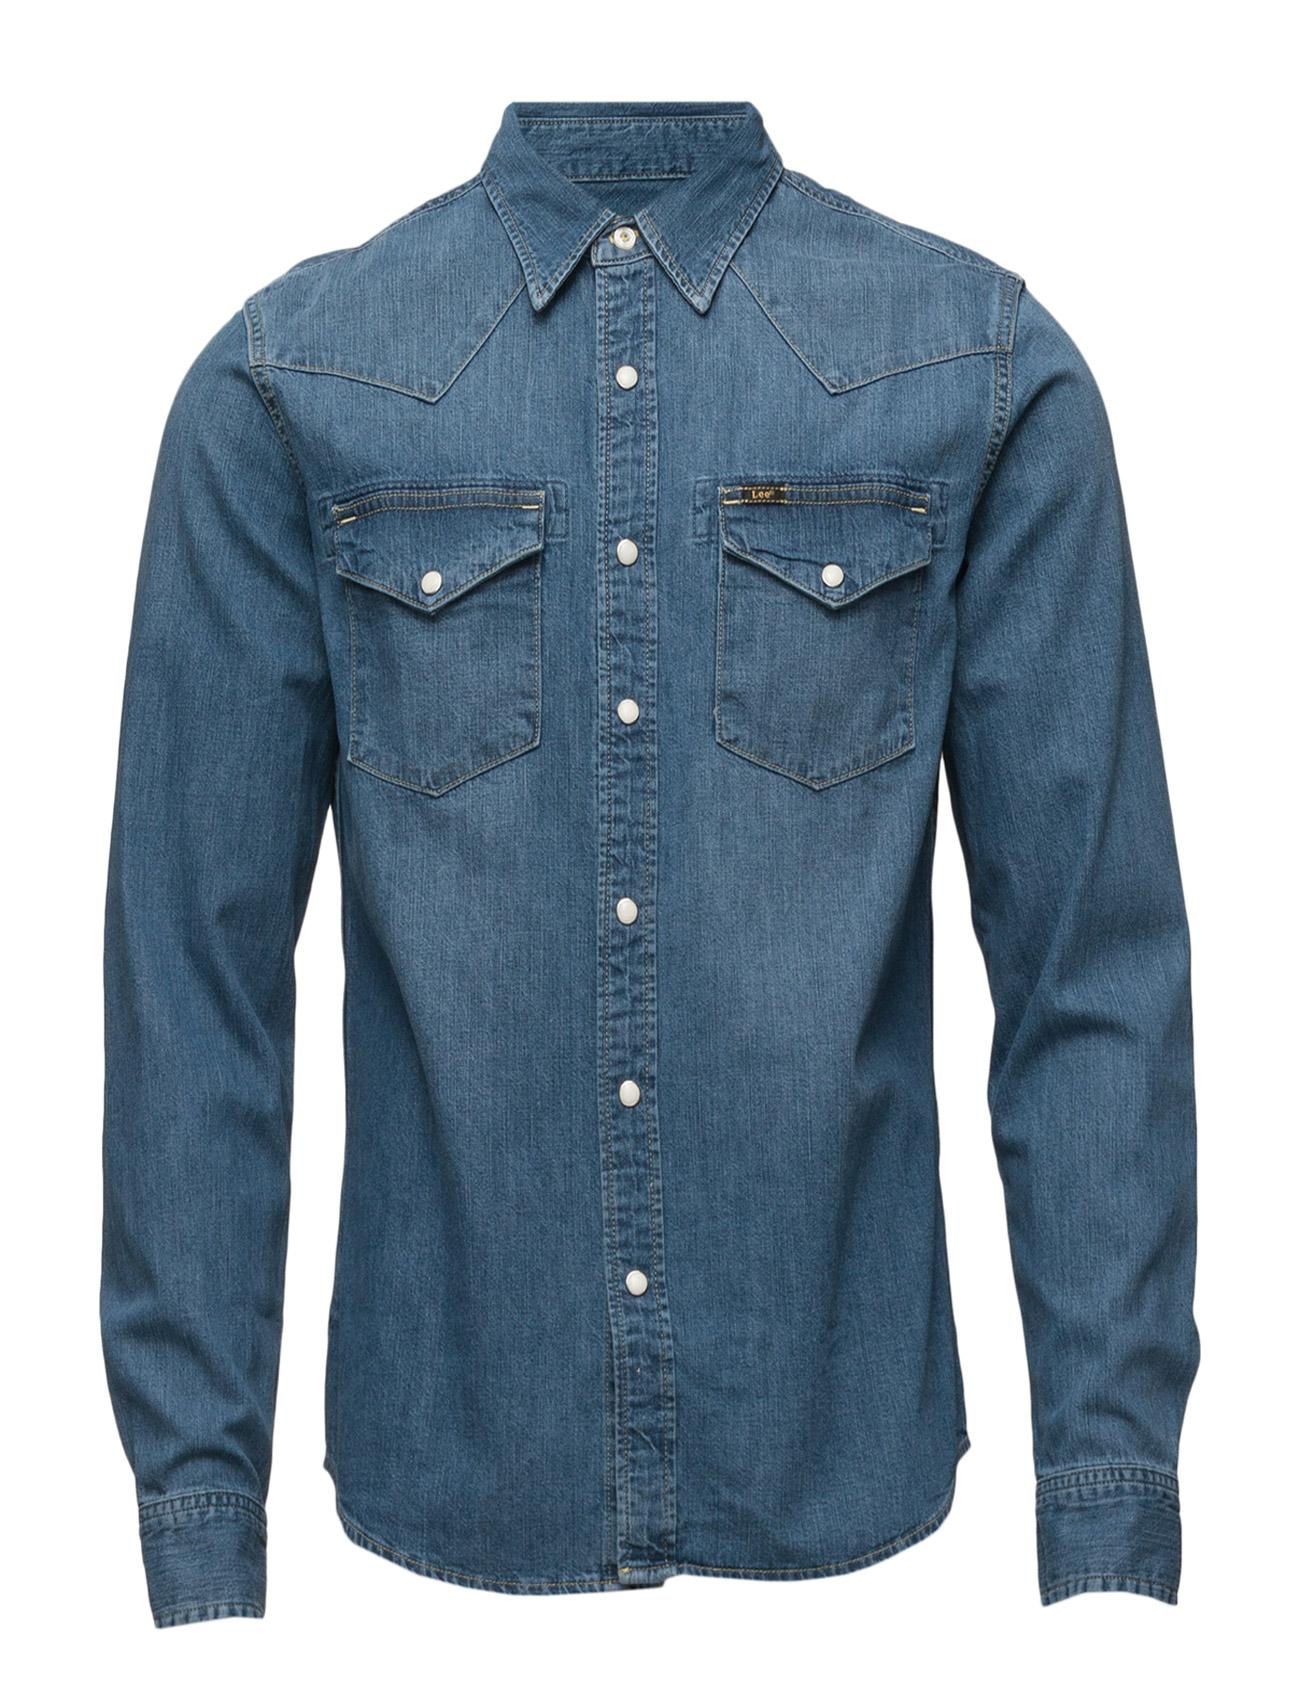 a52d844d5 Lee Western Shirt (Blue Stance) (£80) - Lee Jeans -